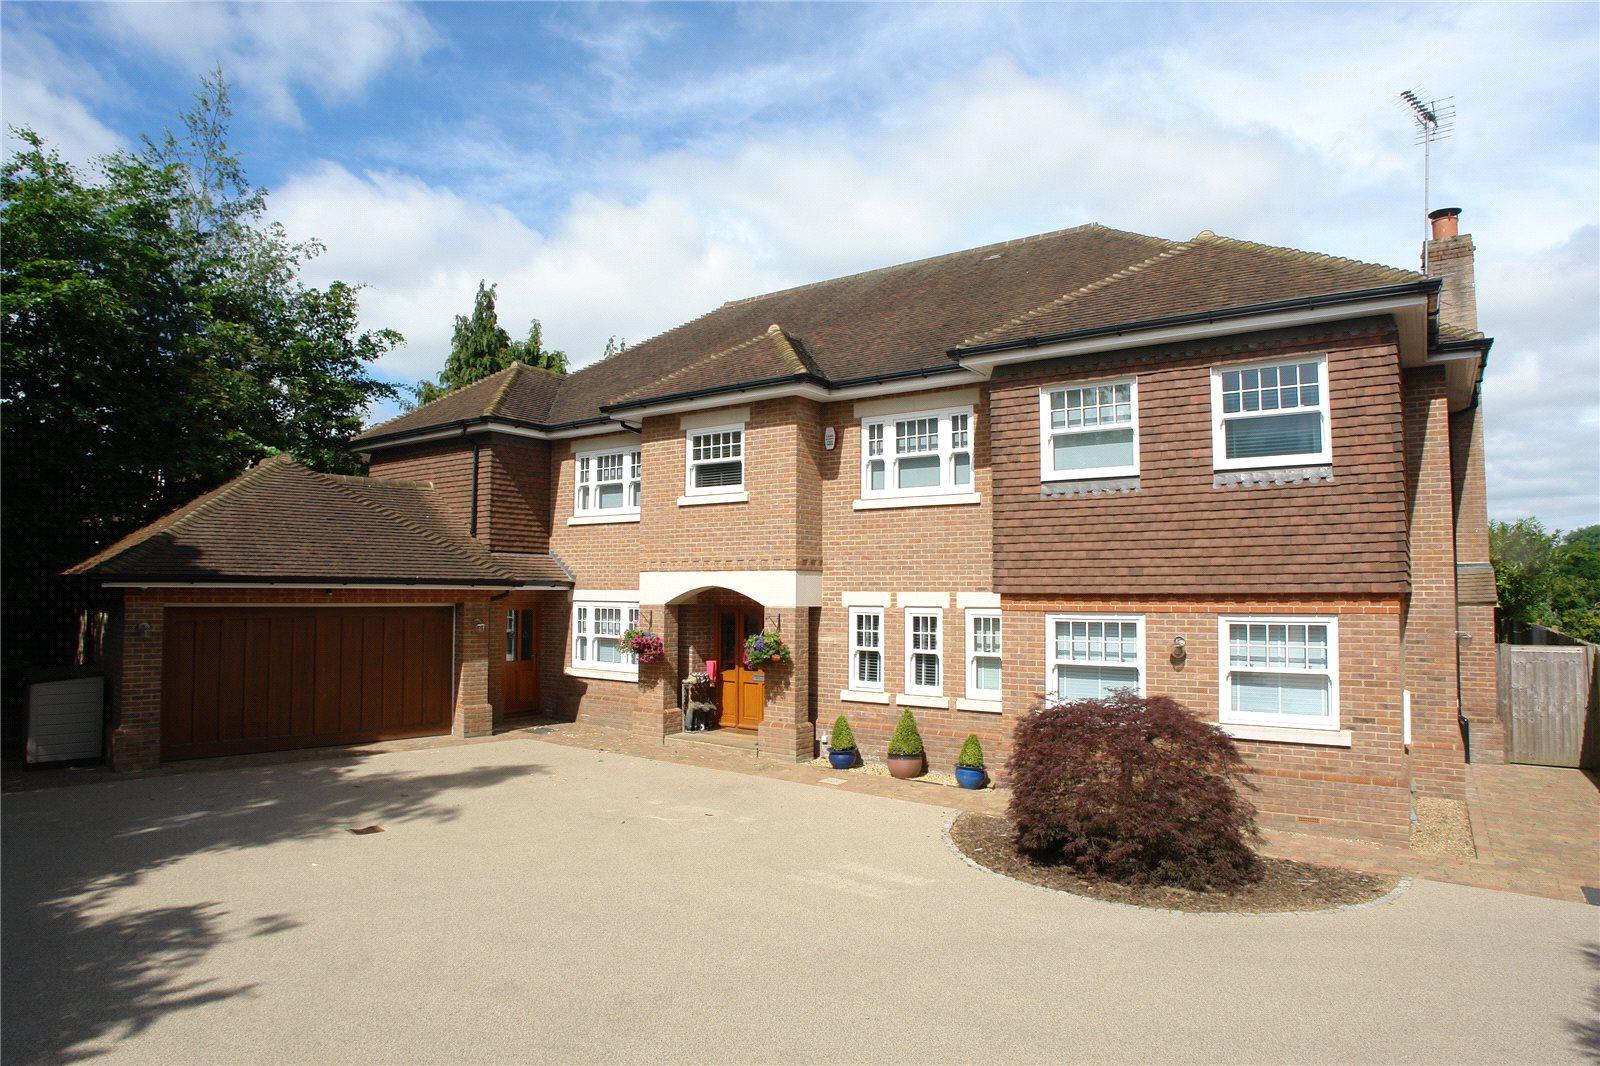 Single Family Home for Sale at Oakfield Road, Harpenden, Hertfordshire, AL5 Harpenden, England